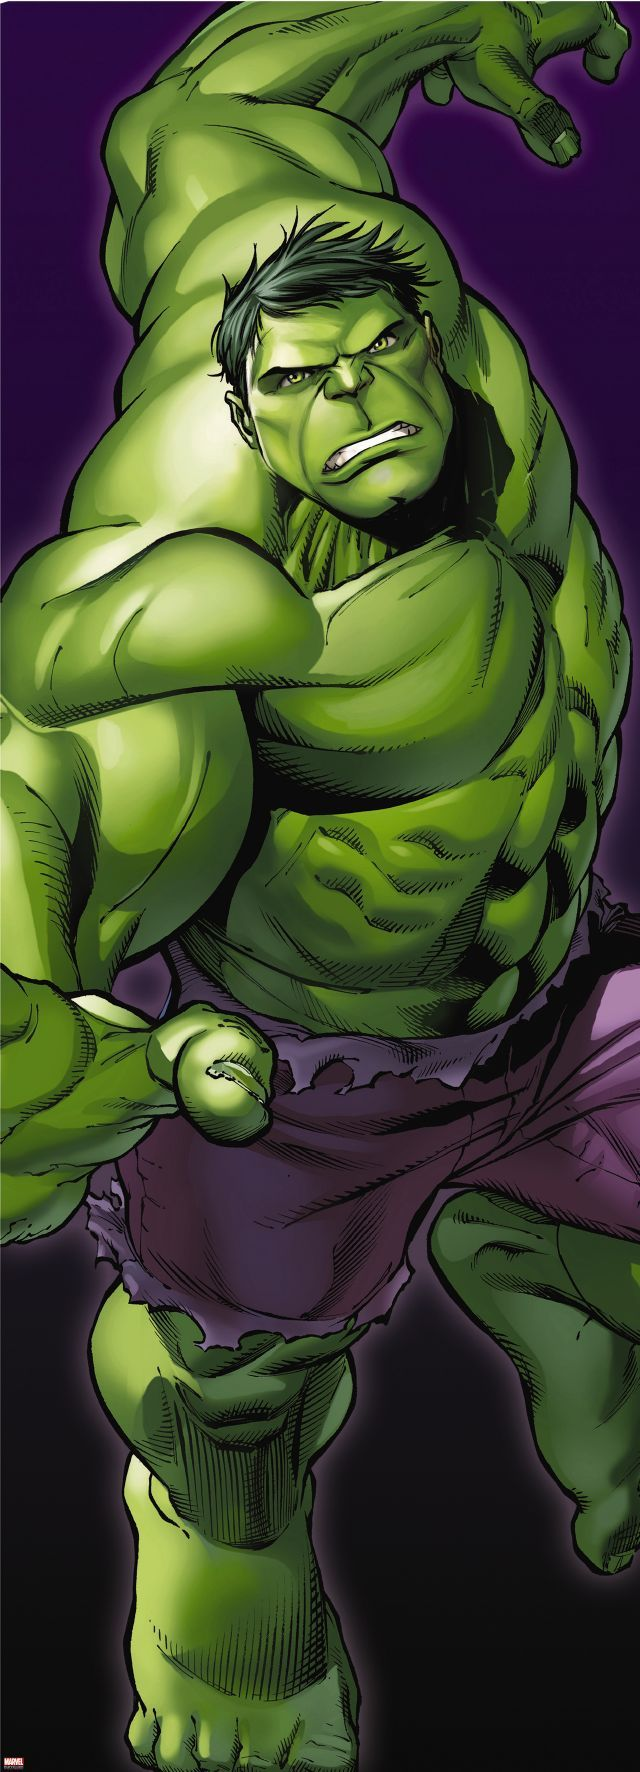 273 best Hulk images on Pinterest | Hulk smash, Incredible ...